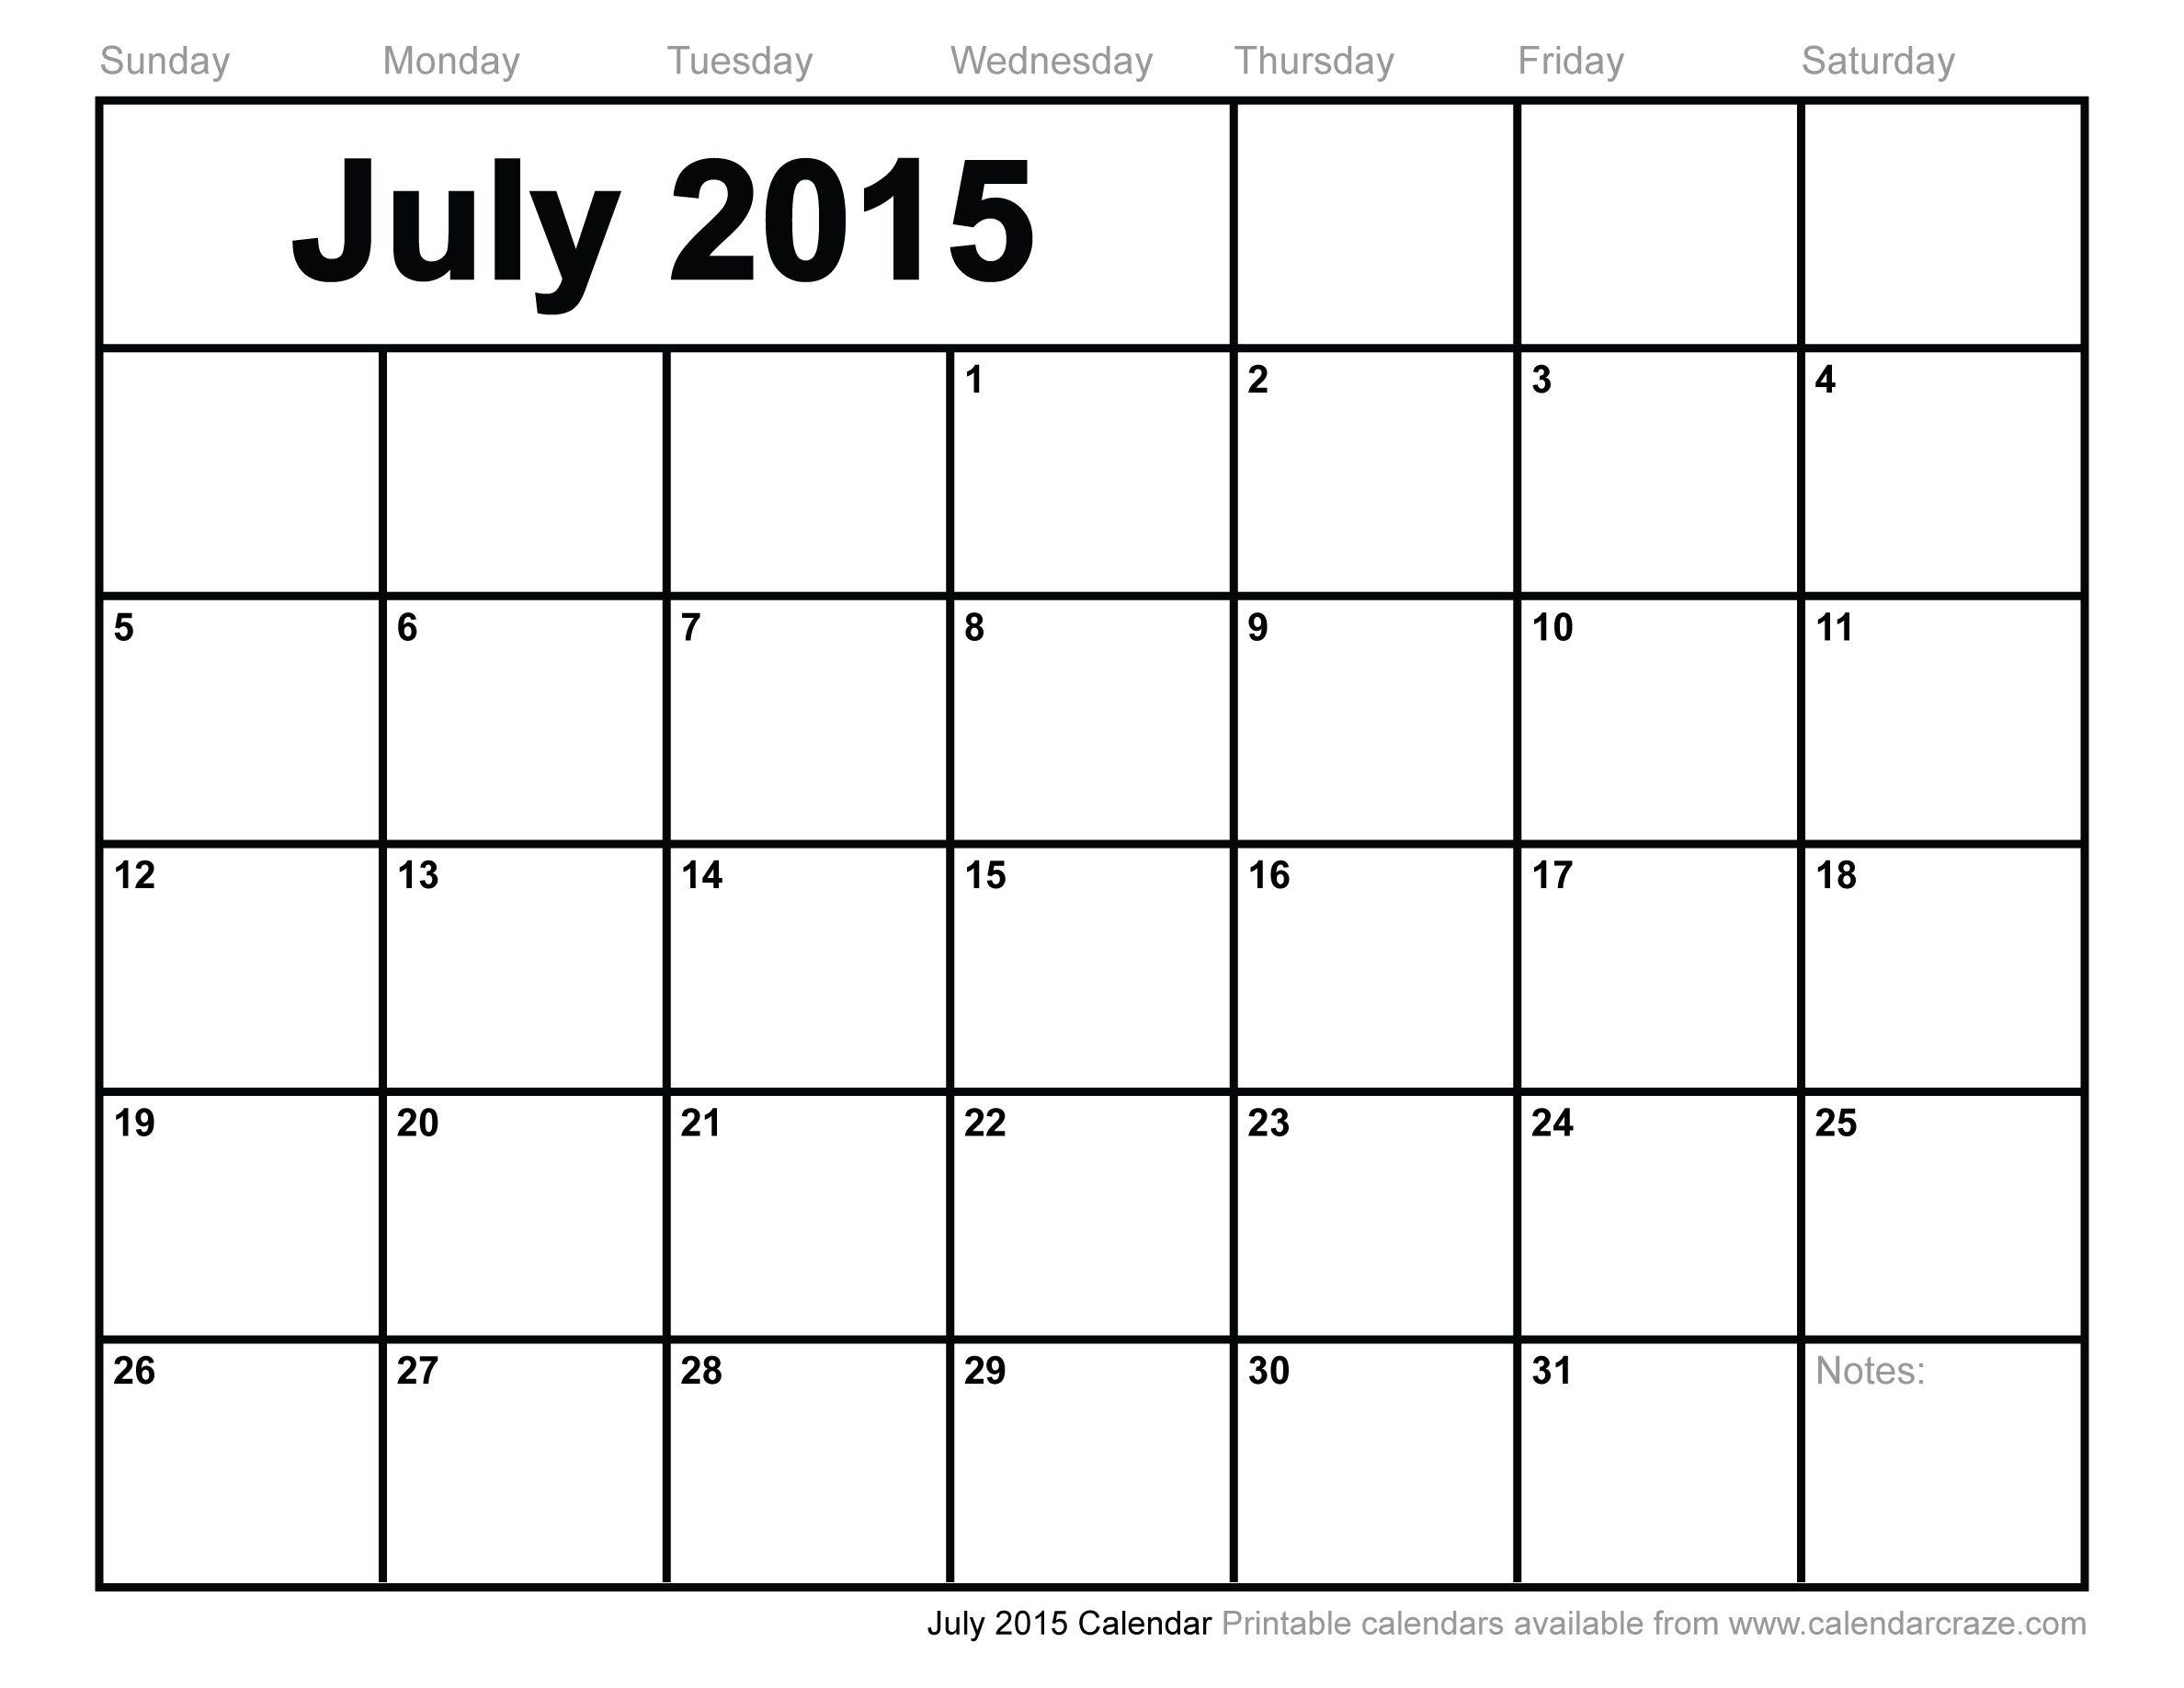 2015 July Calendar Pdf Google Search August Calendar Monthly